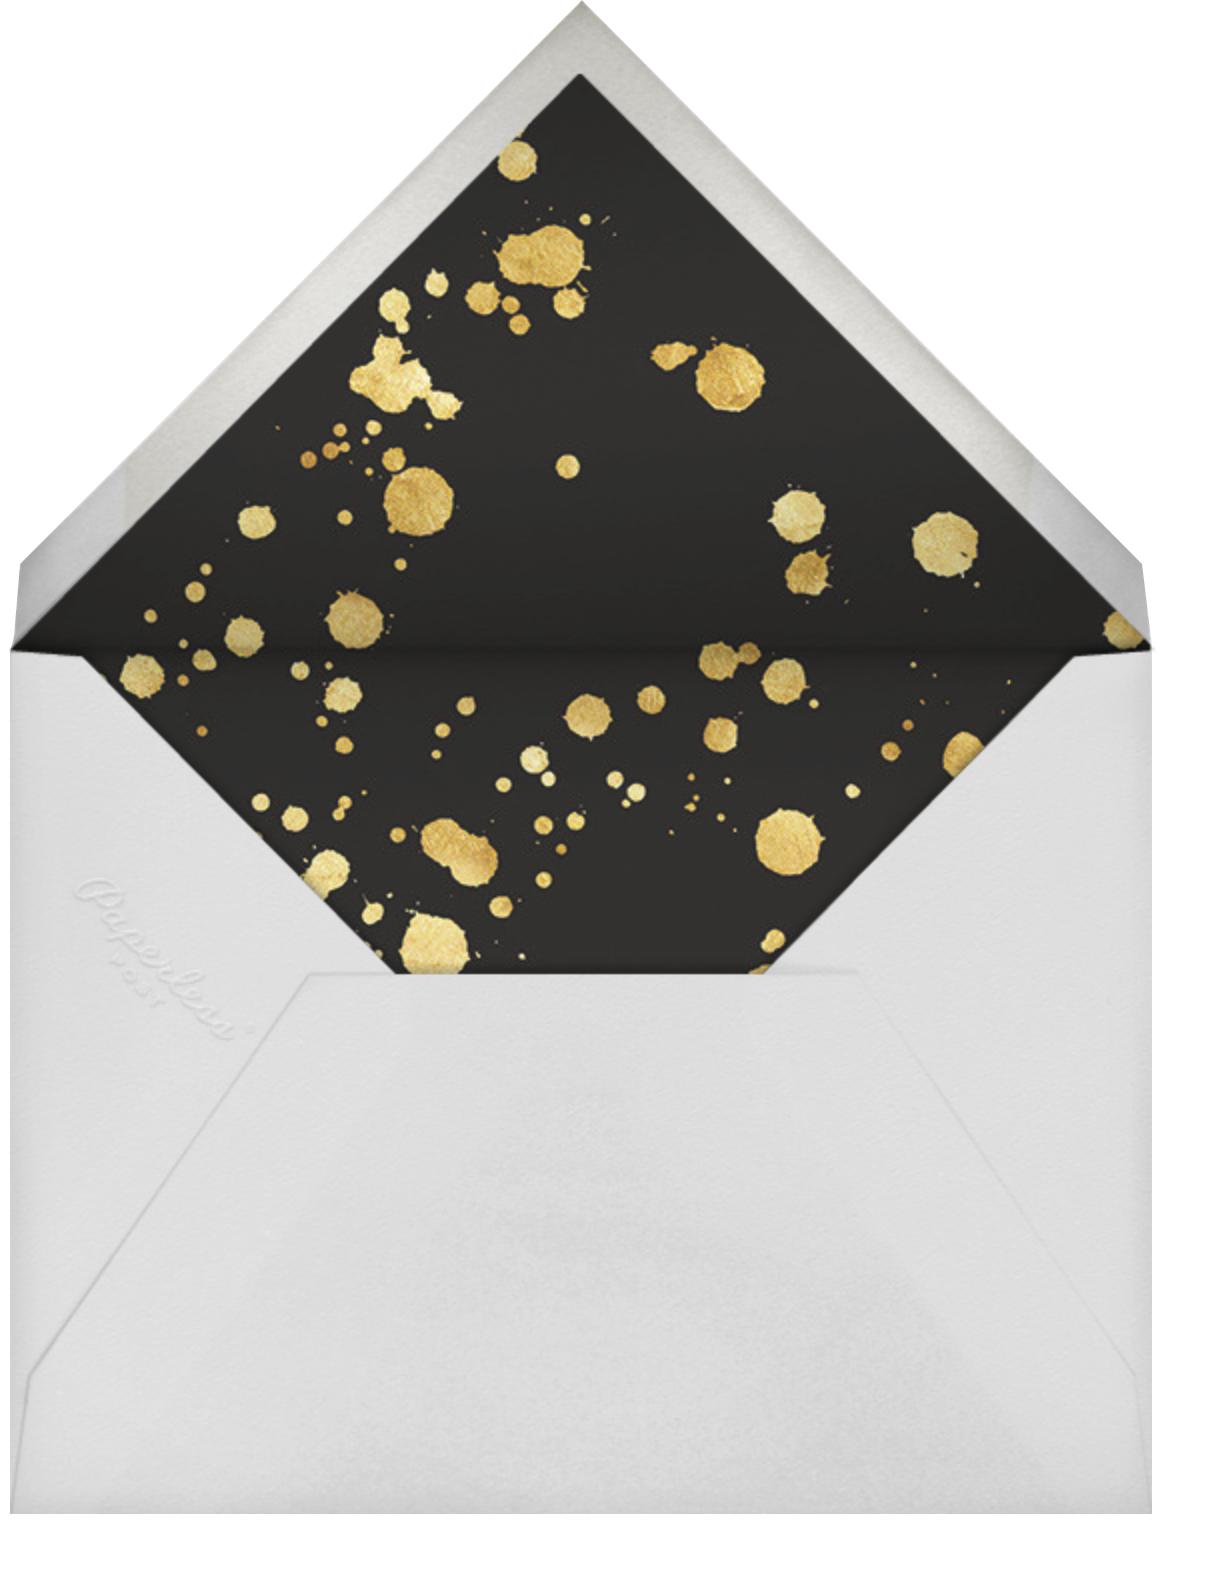 Glint - Kelly Wearstler - Adult birthday - envelope back